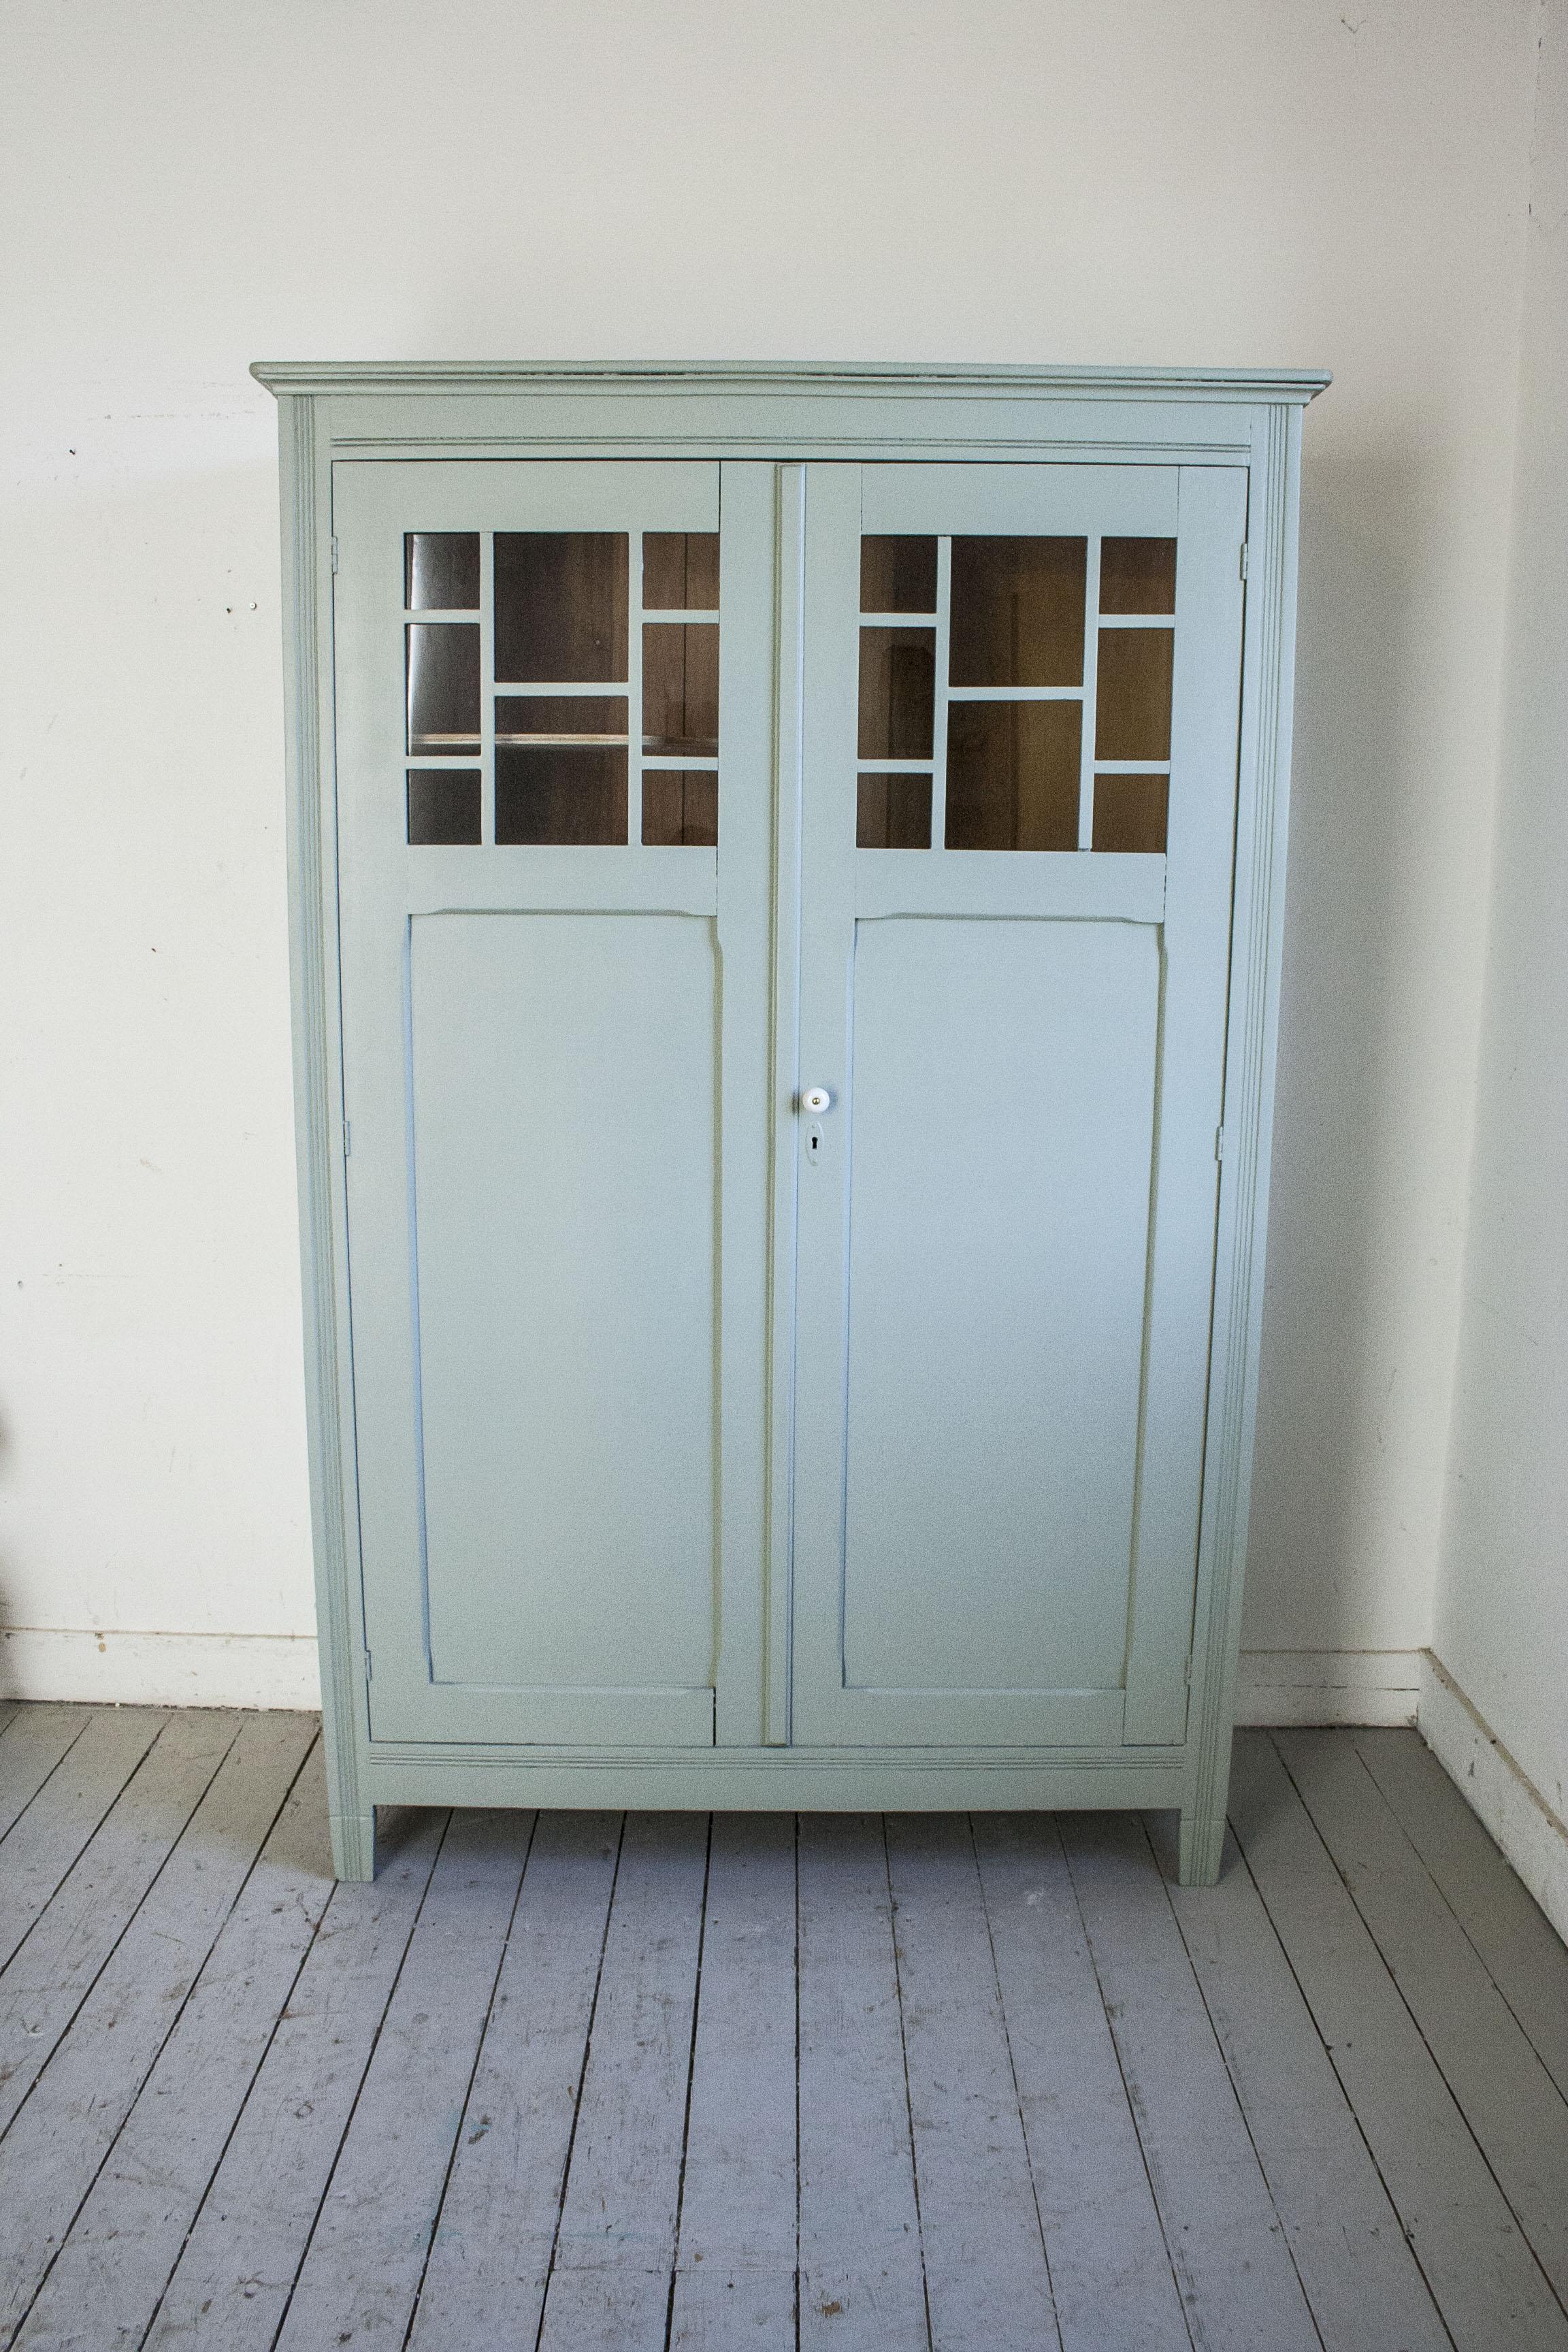 Grijsgroene kledingkast met ruitjes - Firma Zoethout_7.jpg